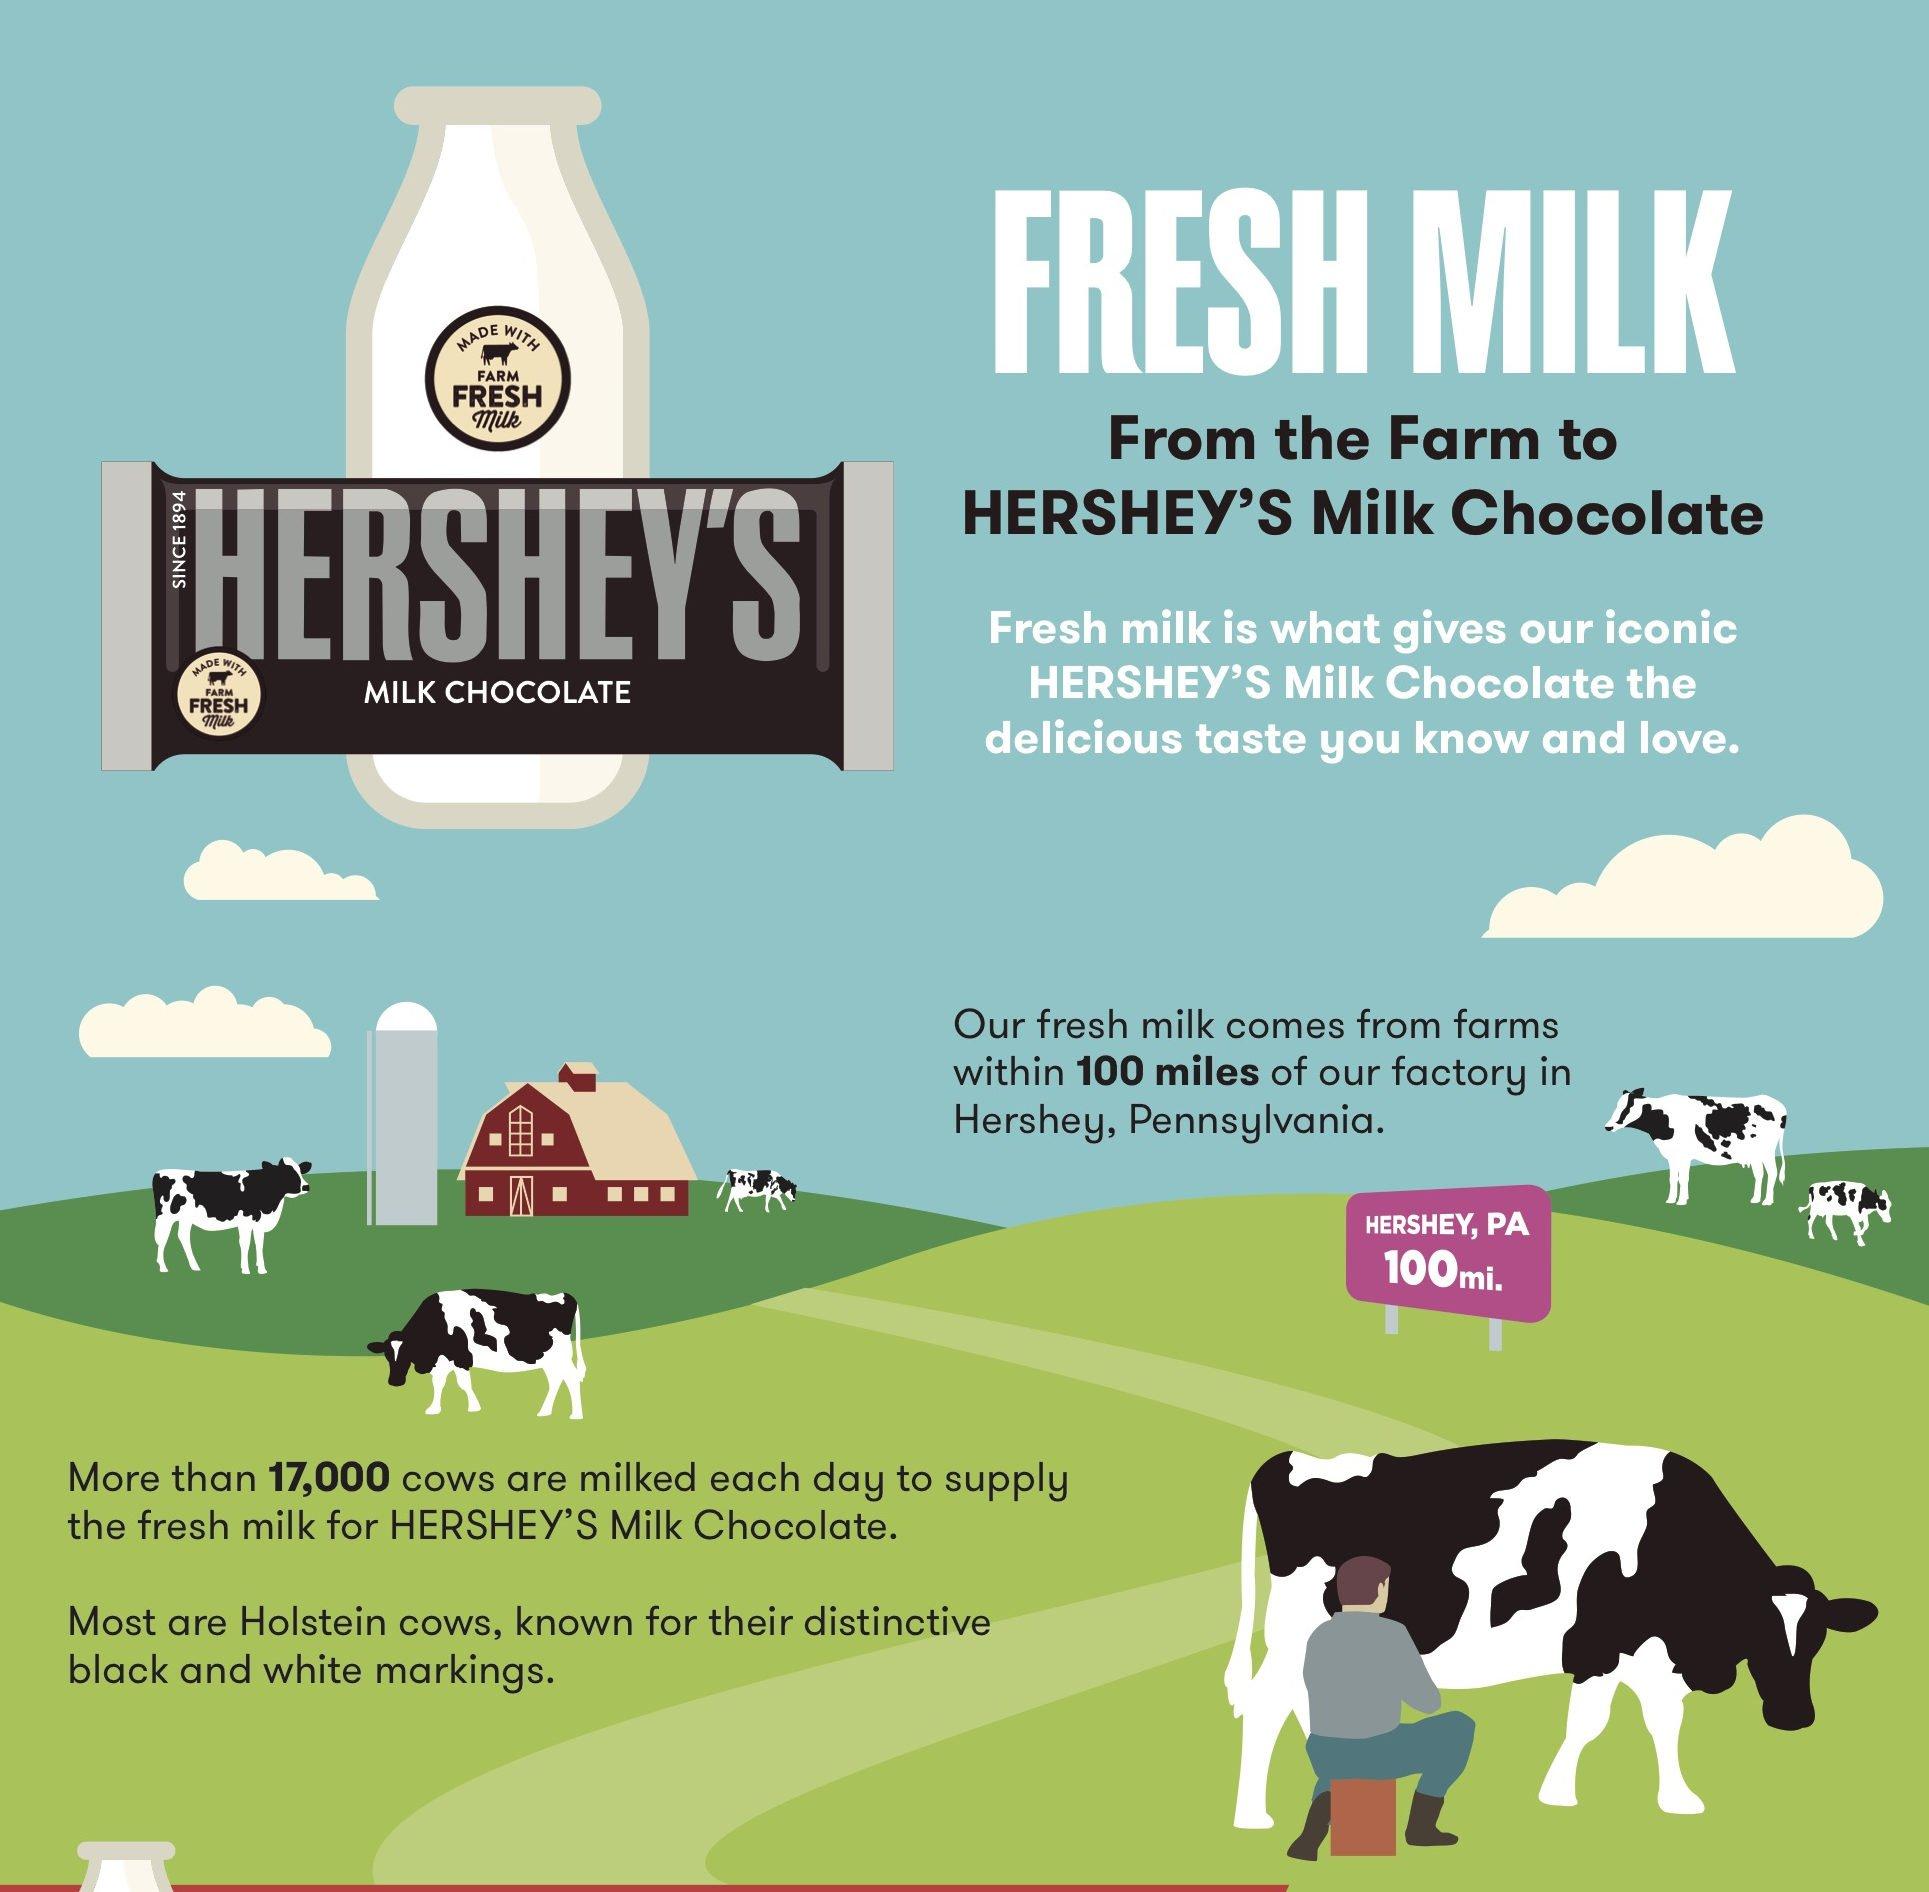 Putting the Farm Fresh Milk in Hershey's Milk Chocolate!